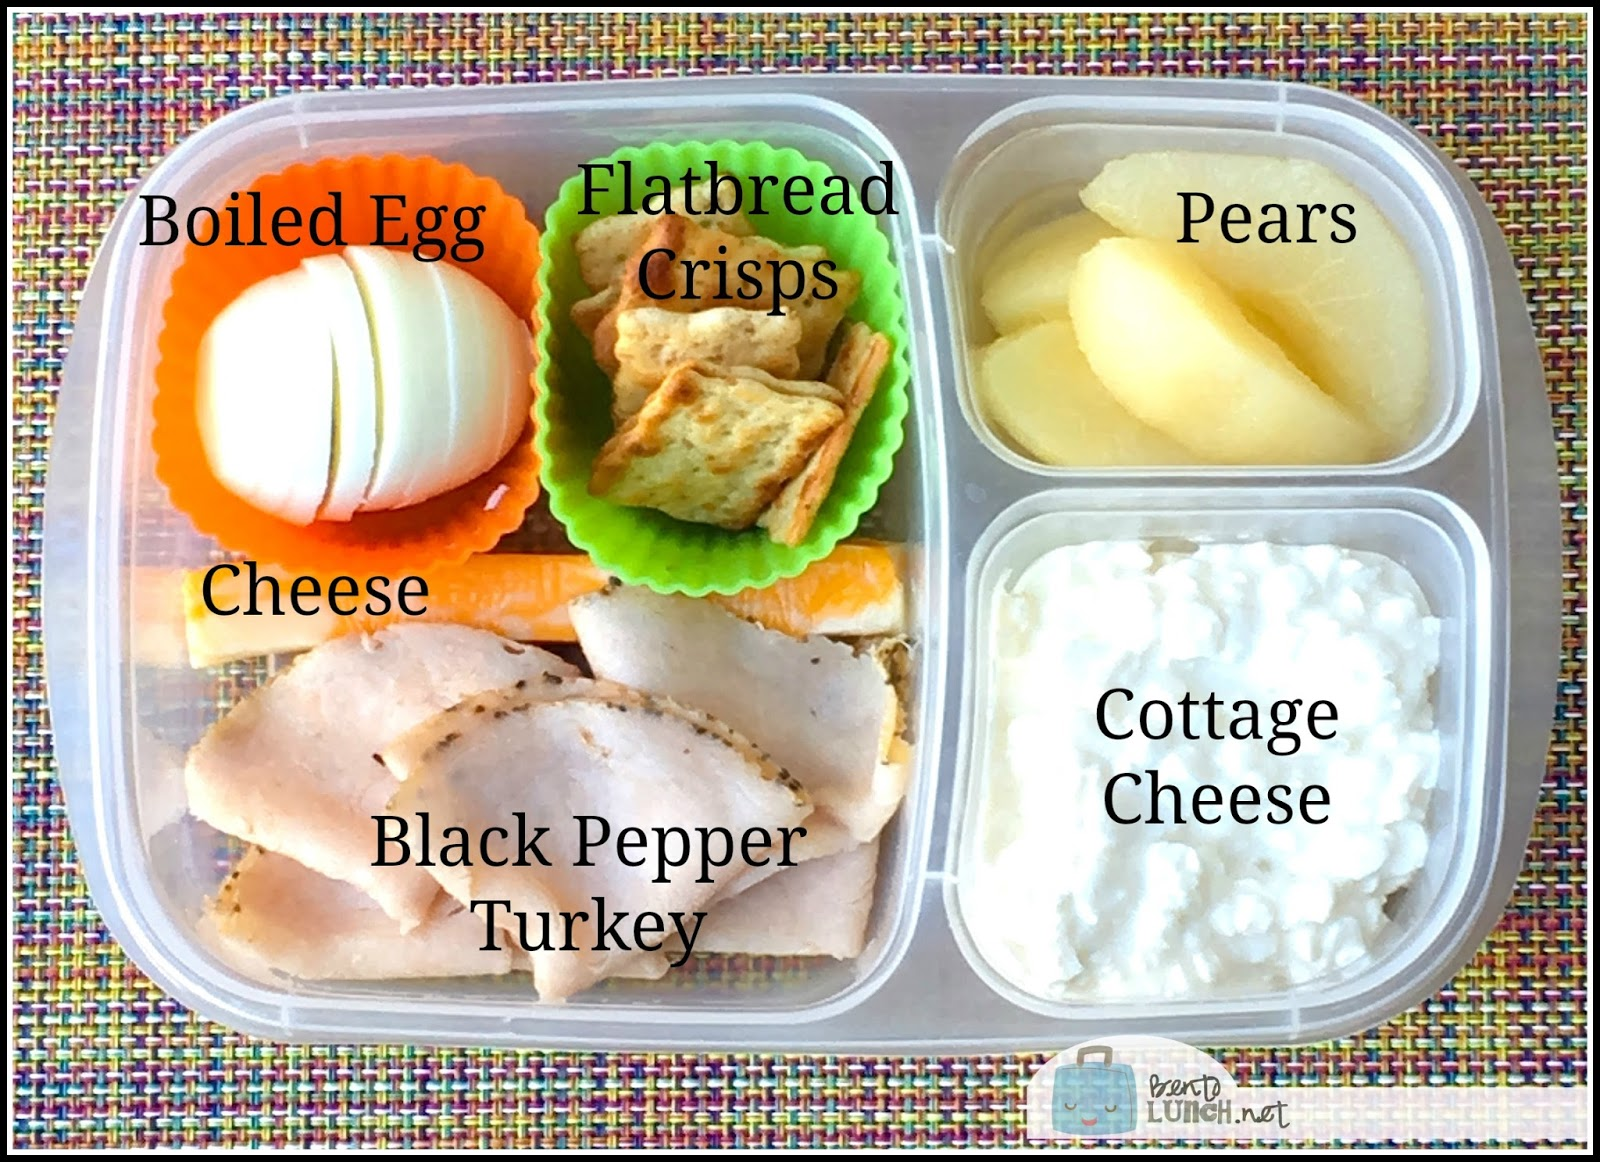 1 marble cheese stick - 60 calories, 5 grams protein, 4.5 grams fat 6  slices black pepper deli turkey - 50 calories, 9 grams protein, 1 gram fat